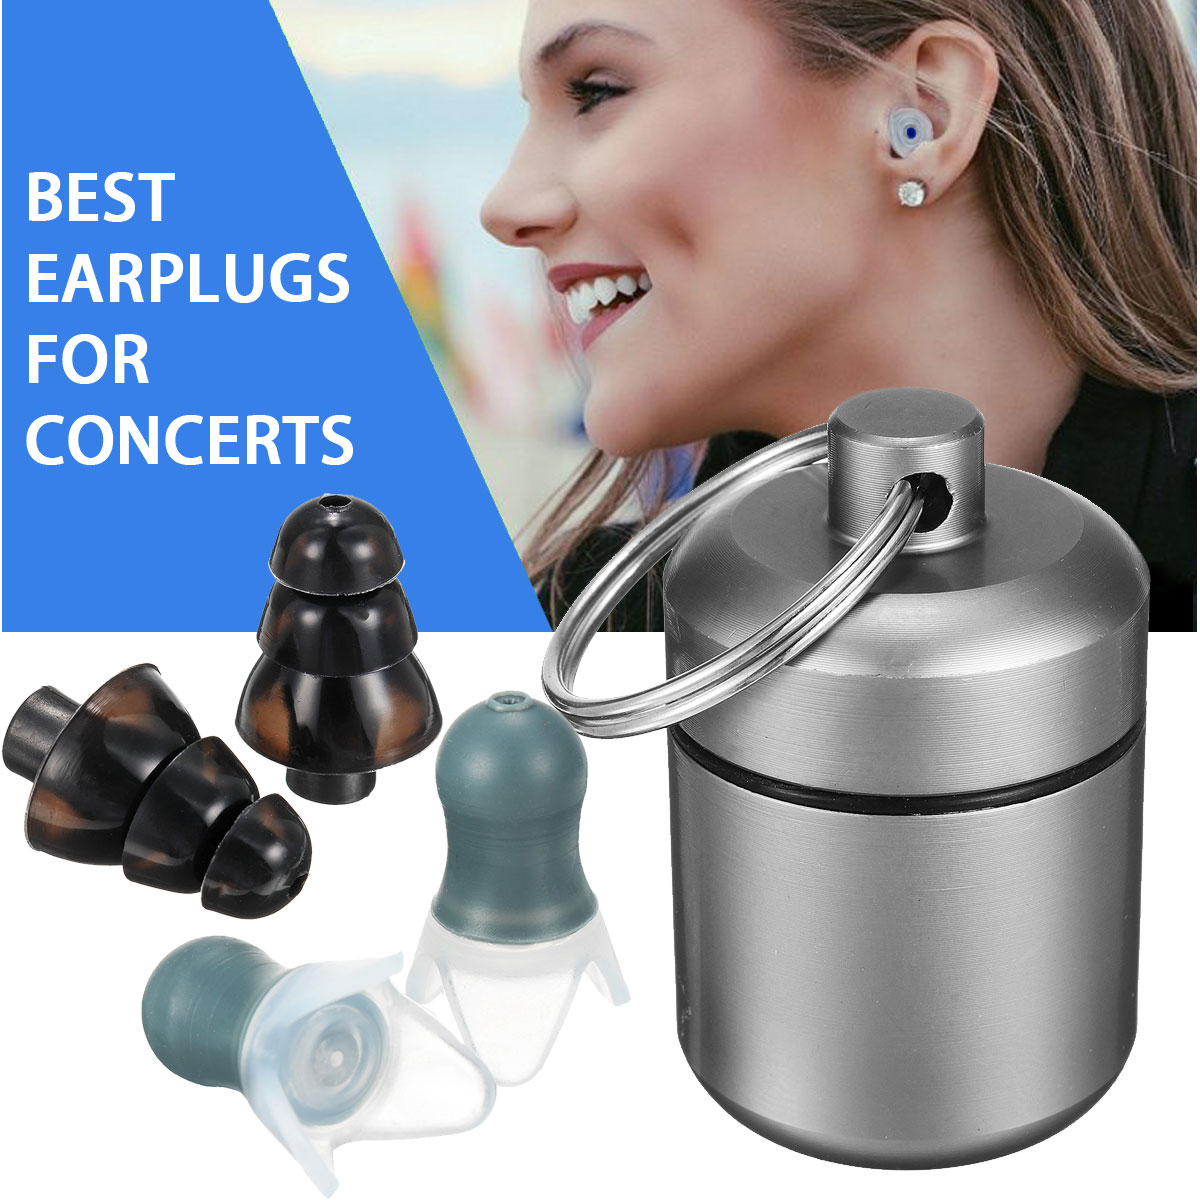 New 2 Pair 27db Noise Canceling Earplugs Swimming Earplugs Music Waterproof Hearing Protectors For DJ Studying Sleeping